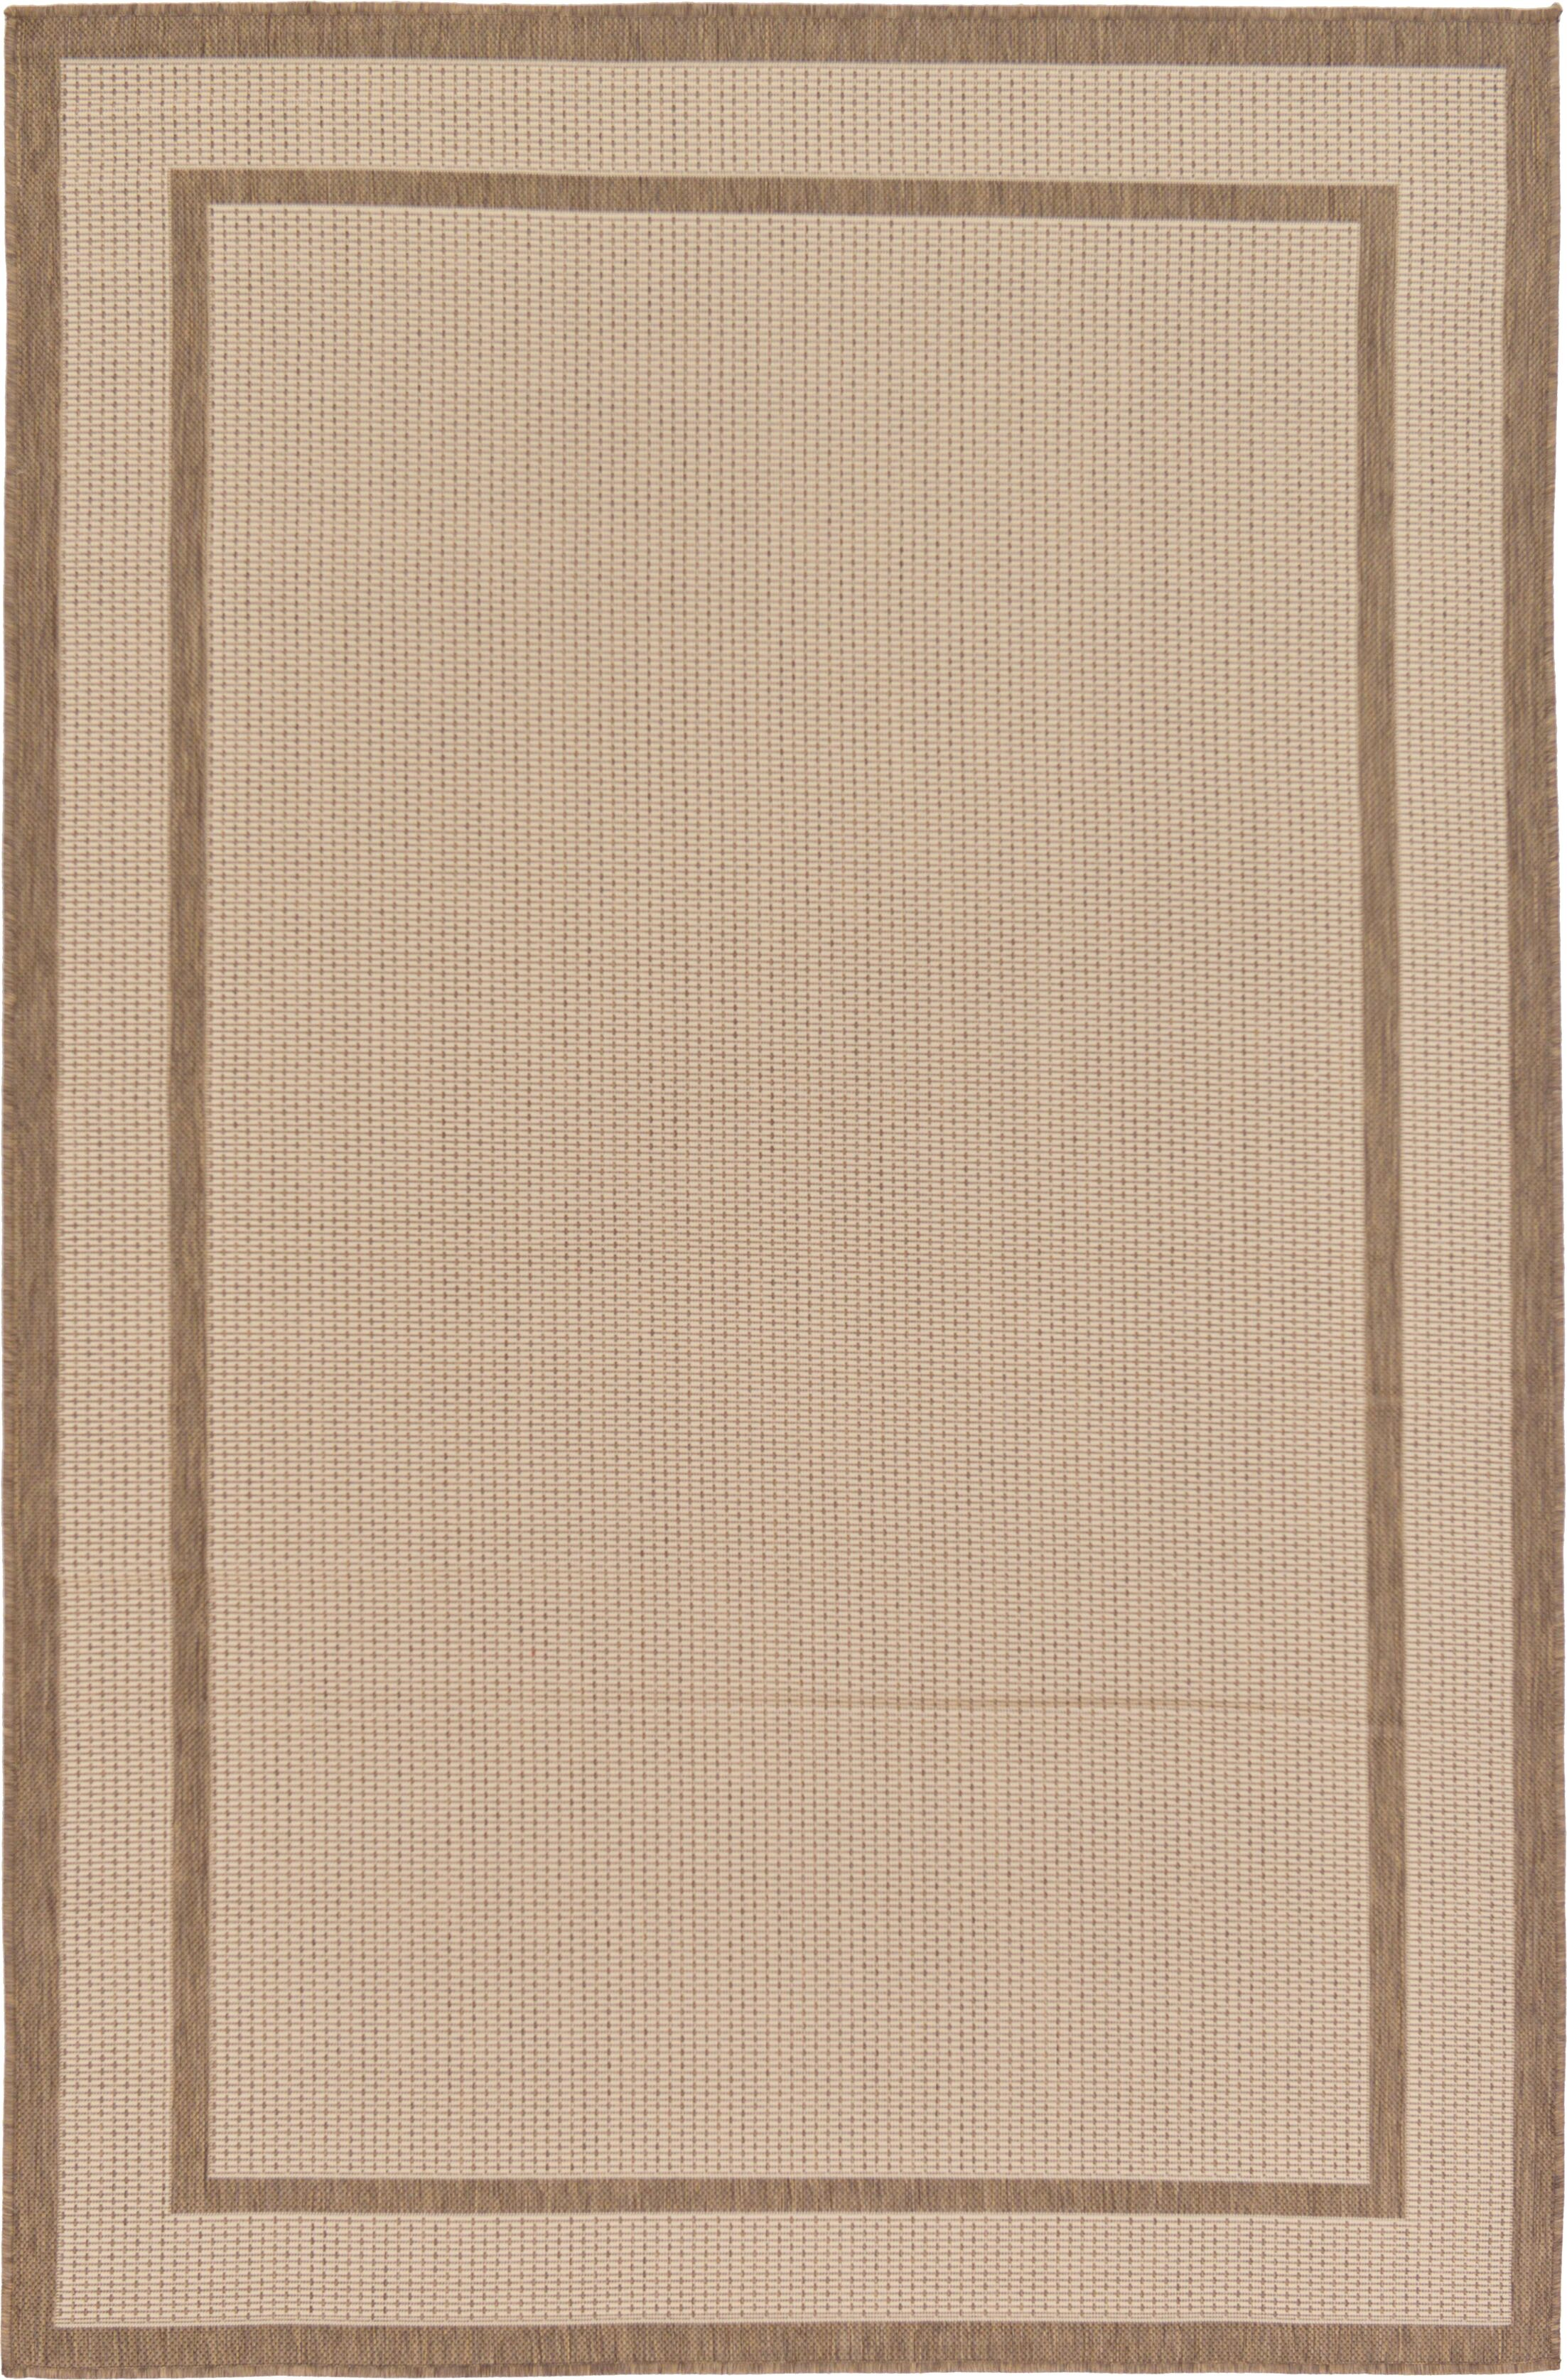 Storrs Beige Outdoor Area Rug Rug Size: Rectangle 8' x 11'4